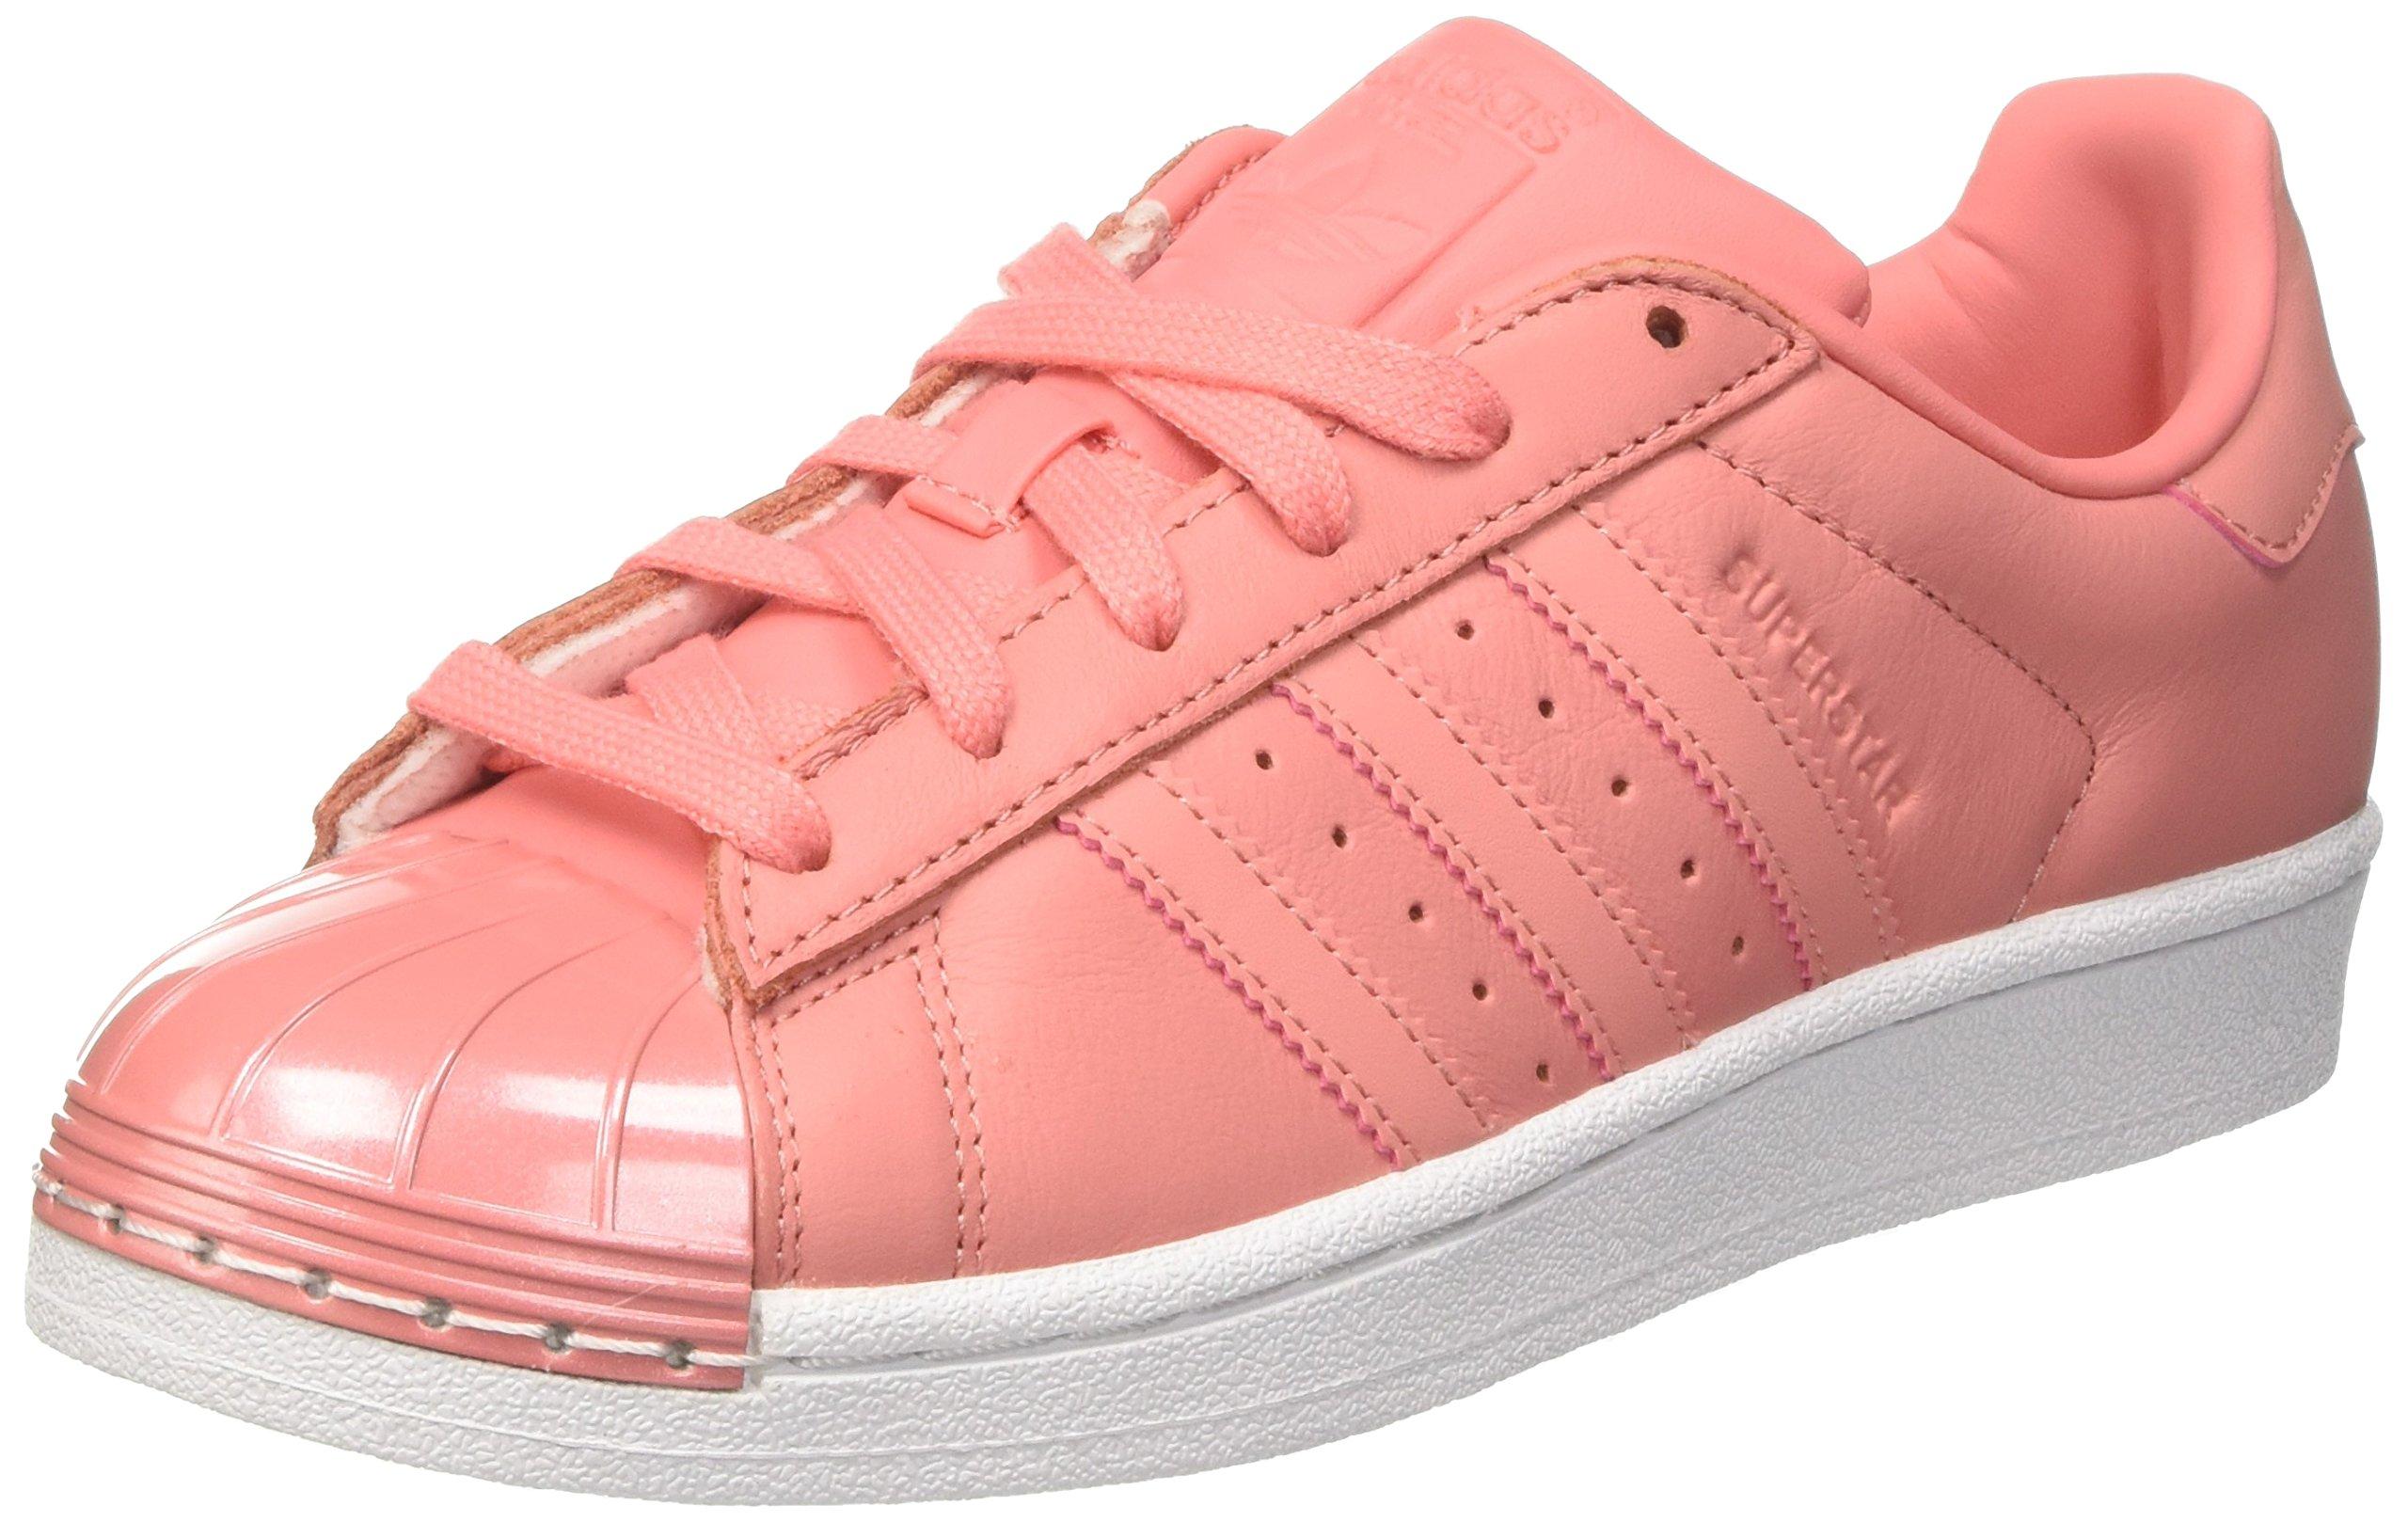 adidas Superstar Metal Toe Womens Style : E-TACROS/TACROS Size : 9.5